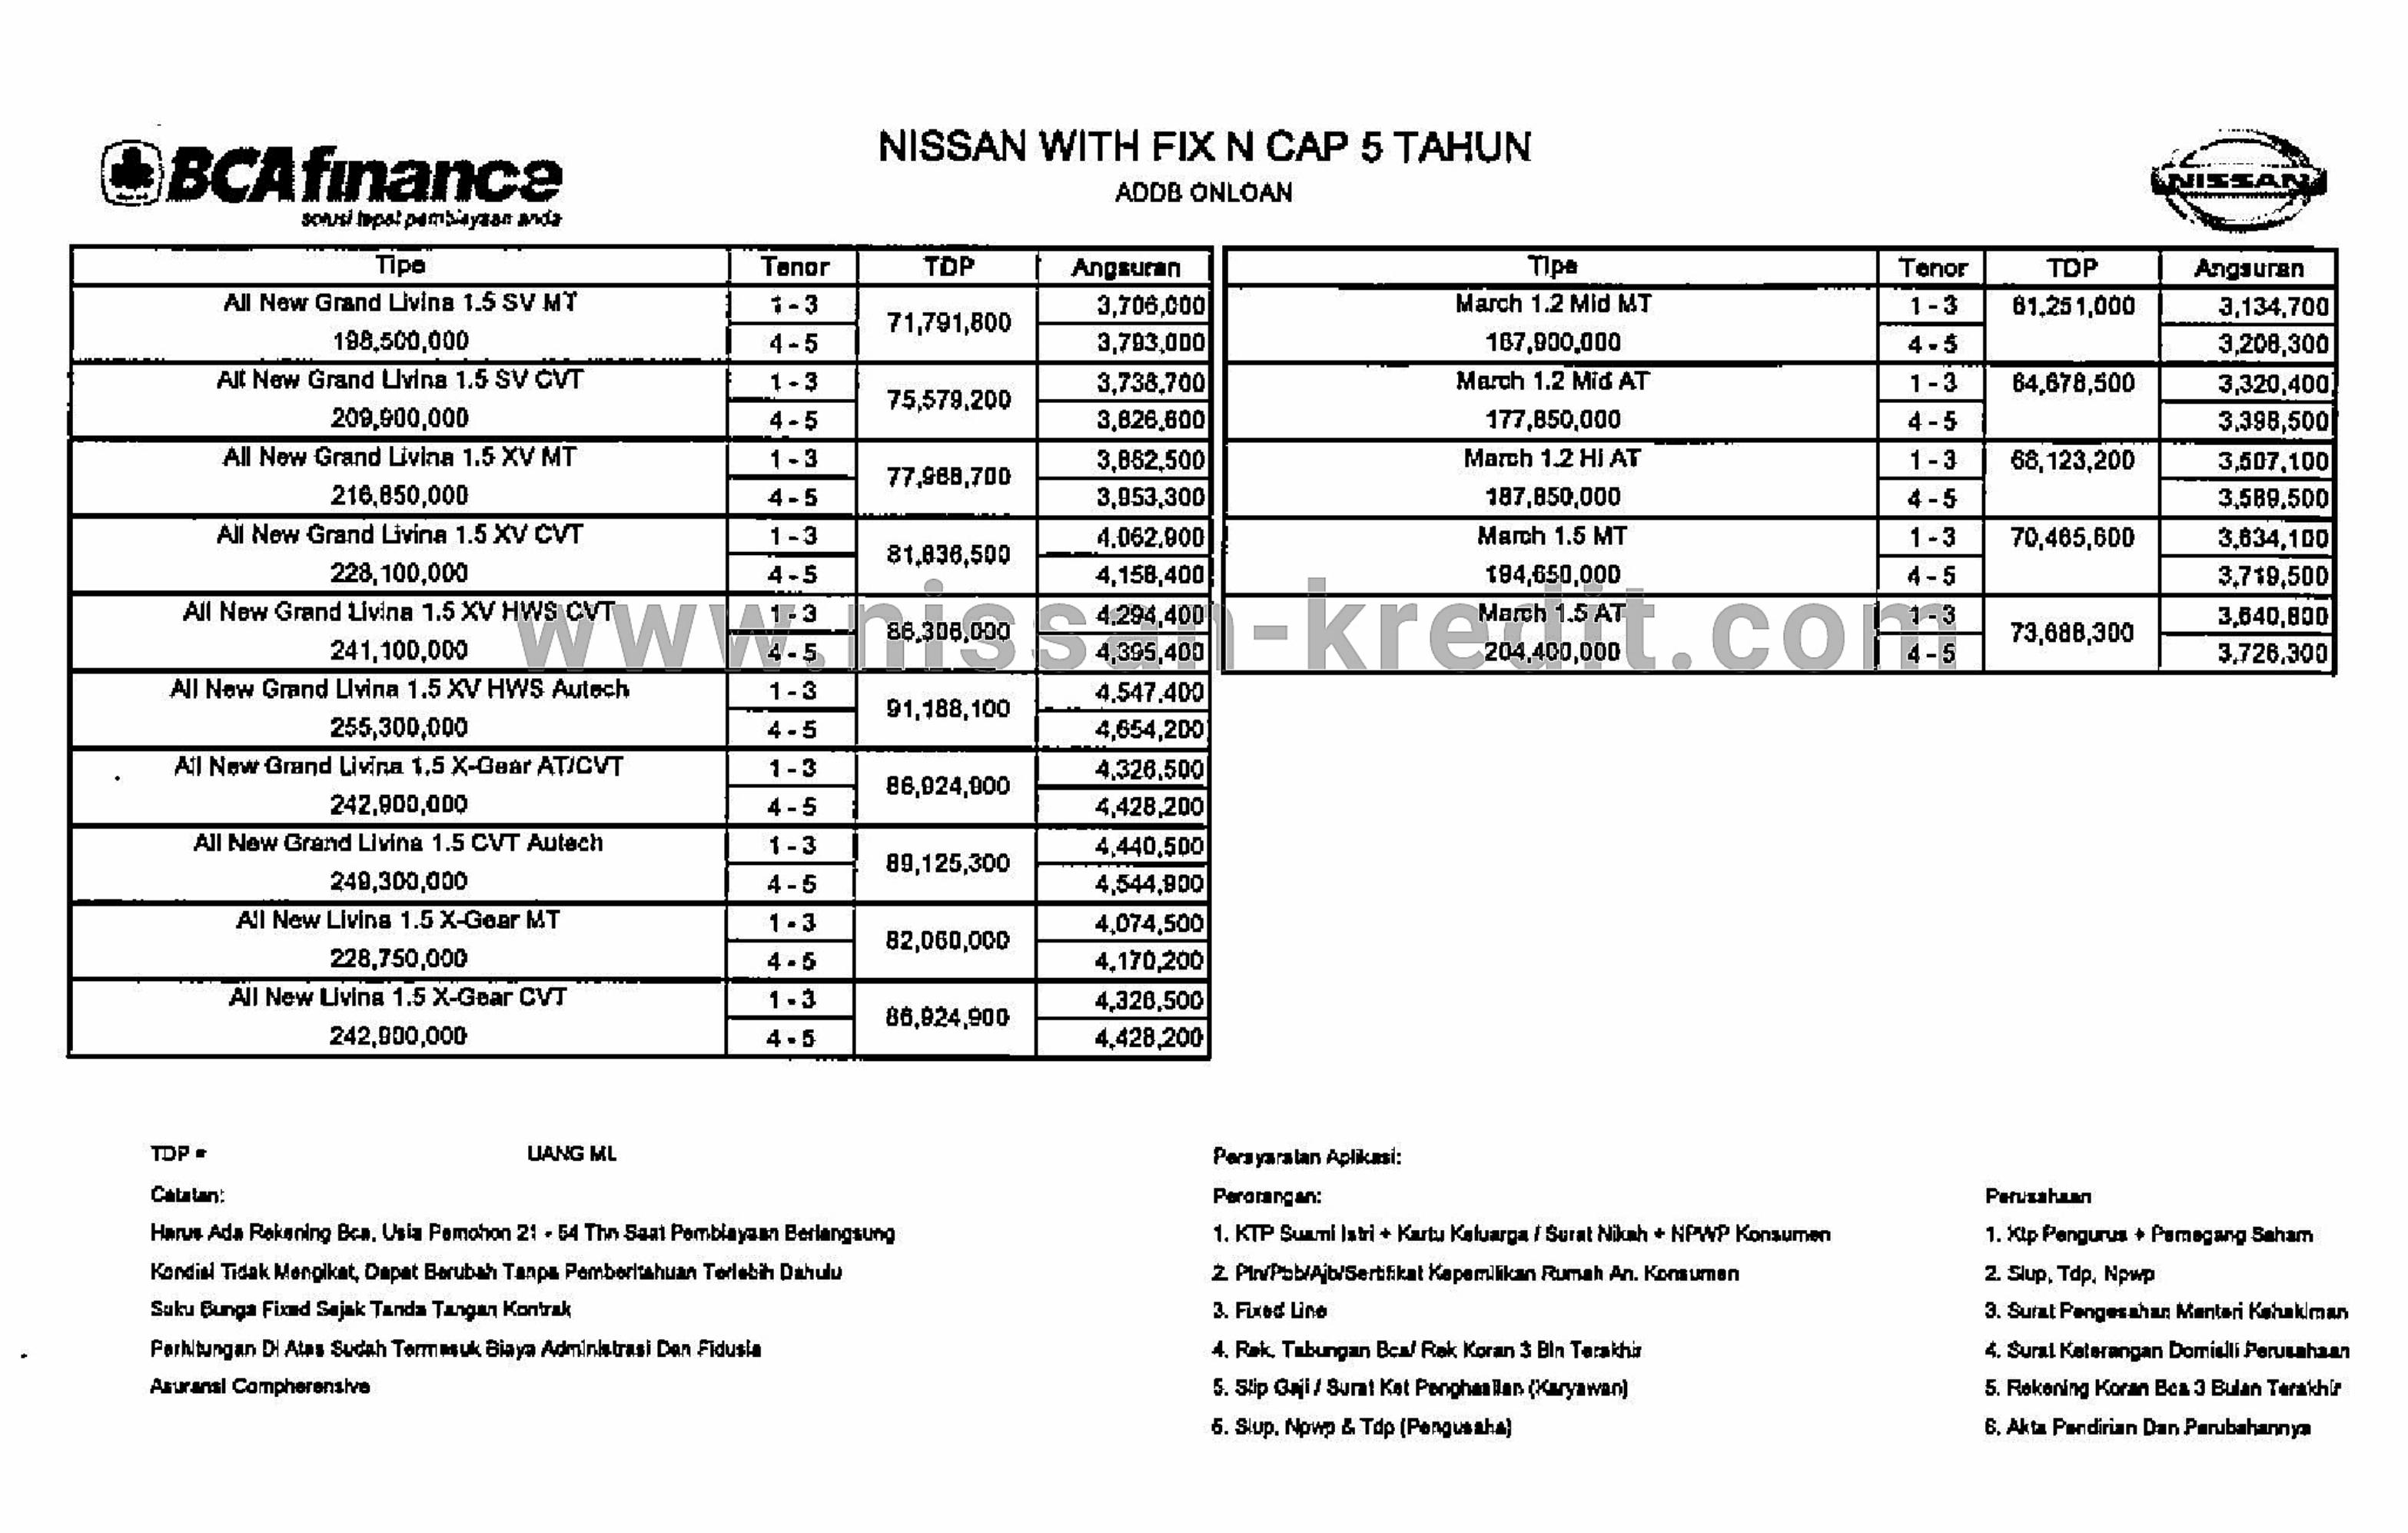 Harga Datsun Go Oktober 2016 - Harga Yos